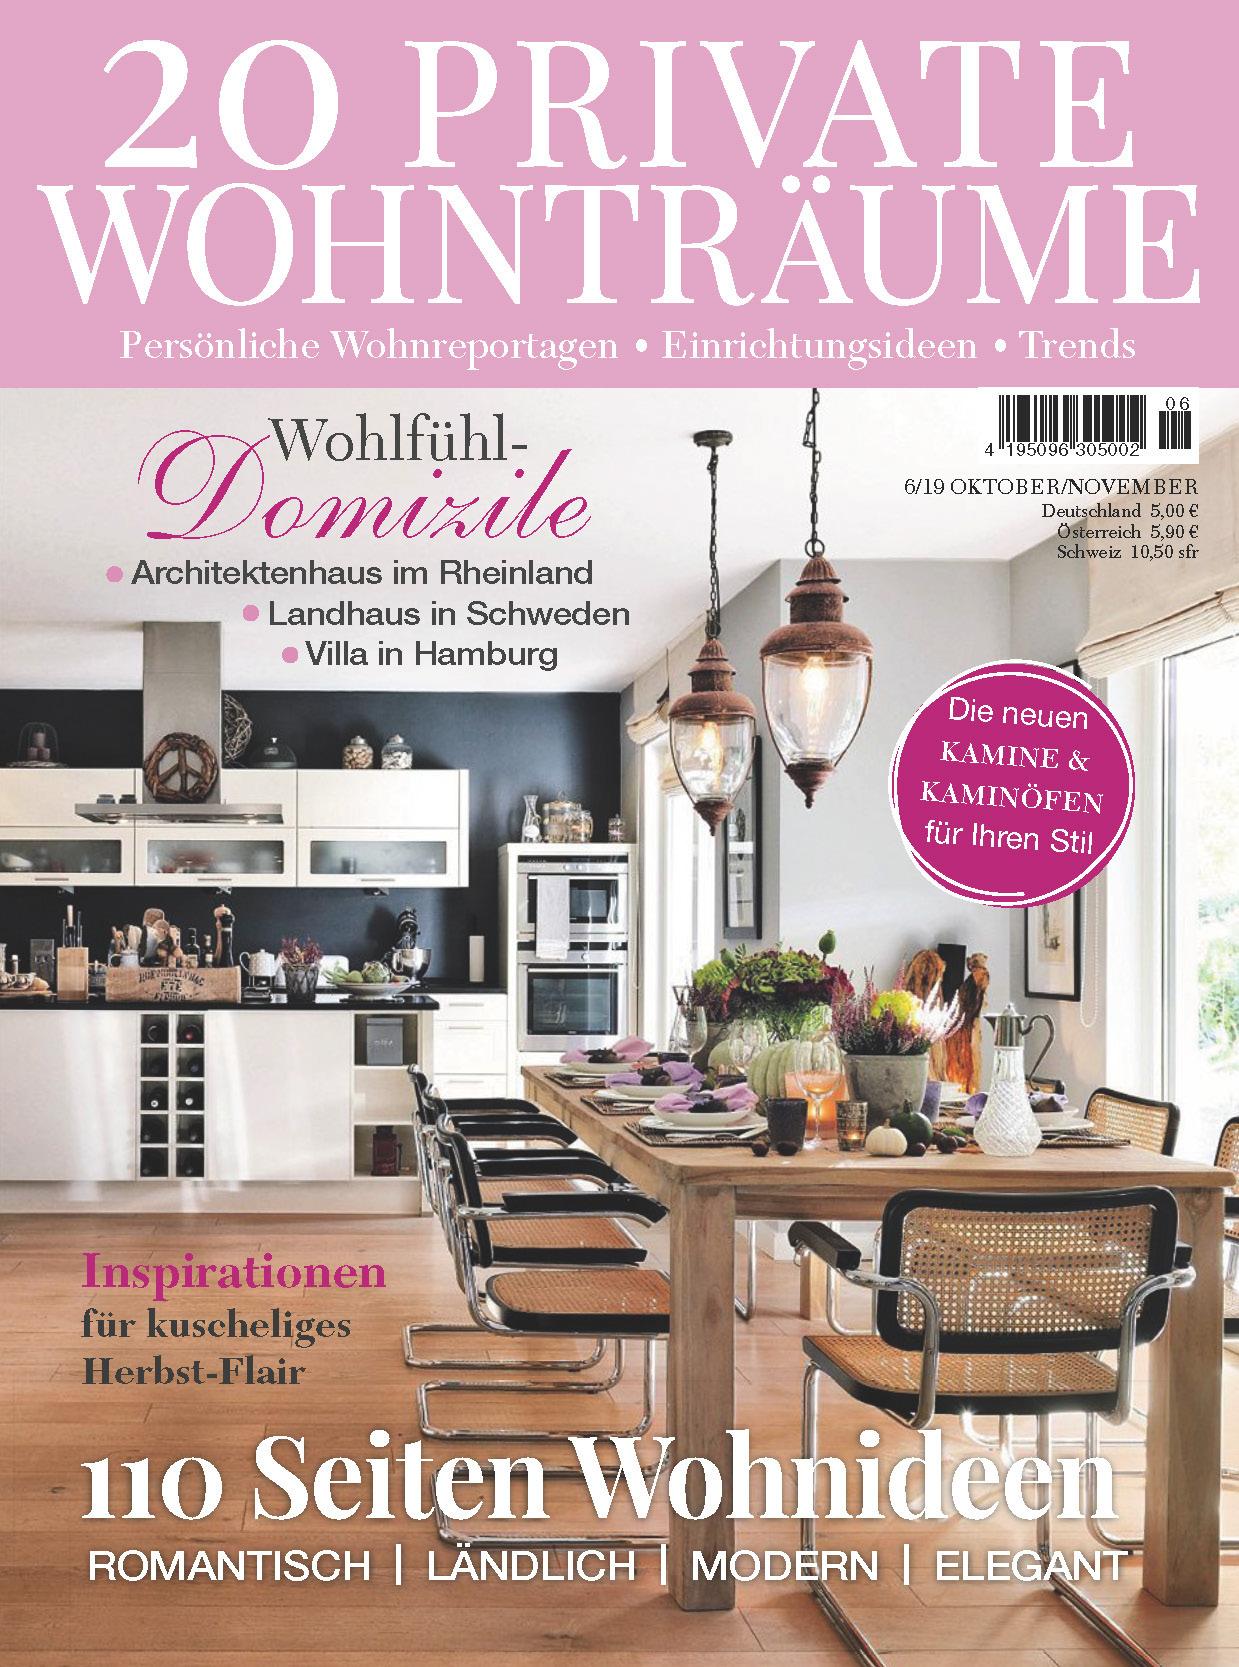 《20 Private Wohntraume》德国版室内室外设计杂志2019年10-11月号